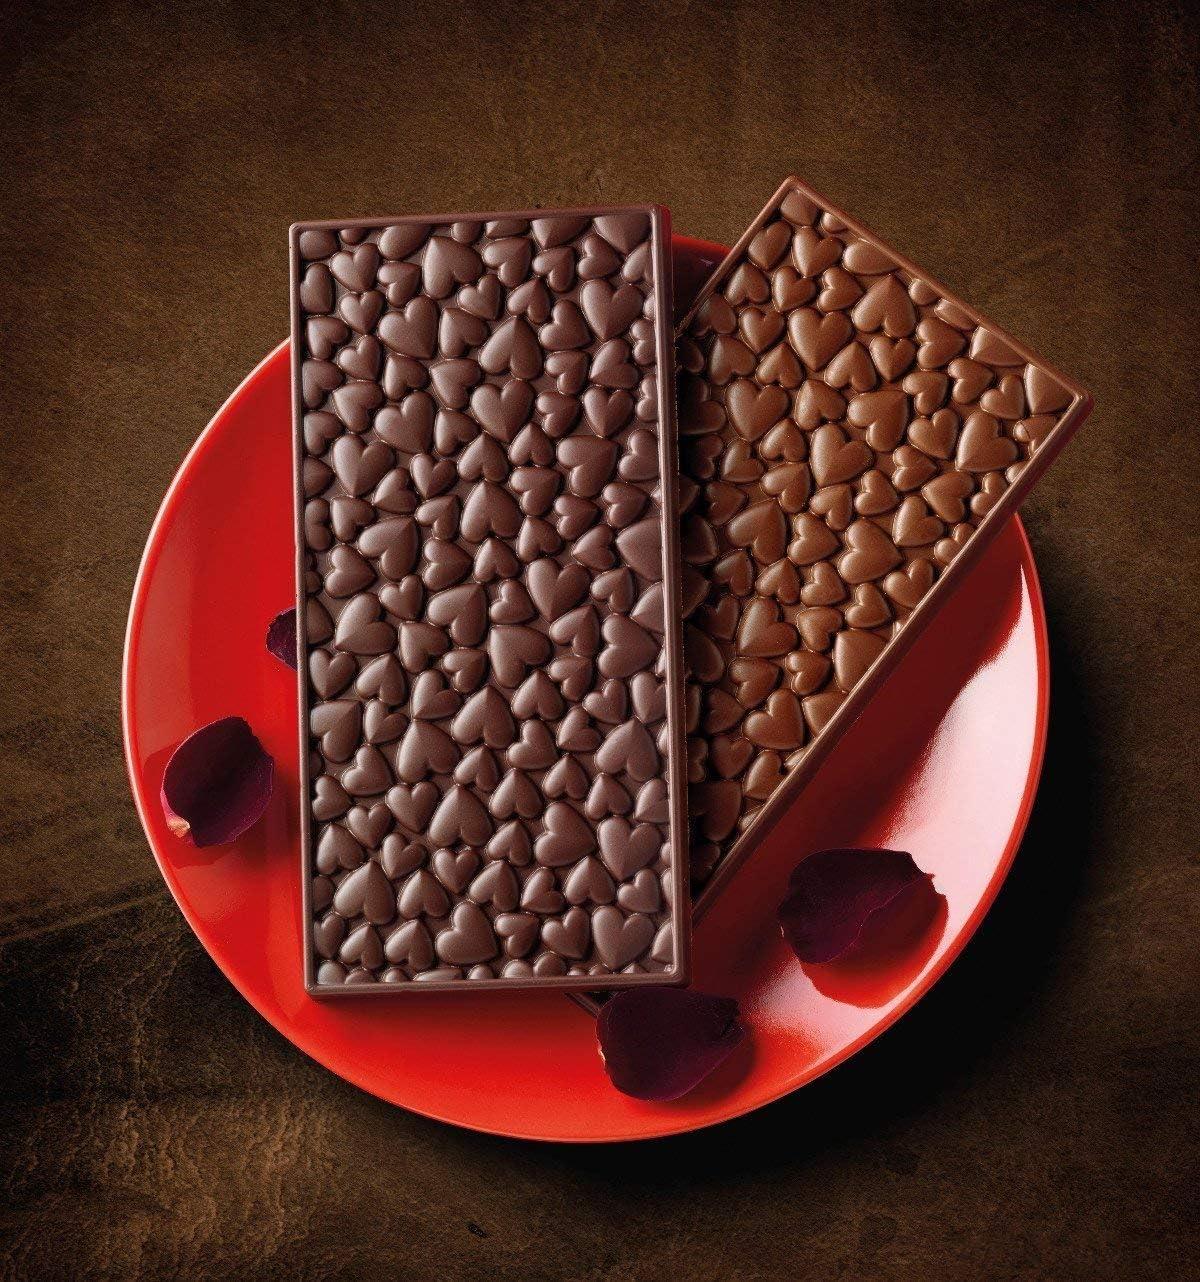 Unbekannt Silikomart 195932/Chocolate Forma Love Choco Bar Chocolate Forma Silicona 11,7/x 7,9/x 11/cm marr/ón